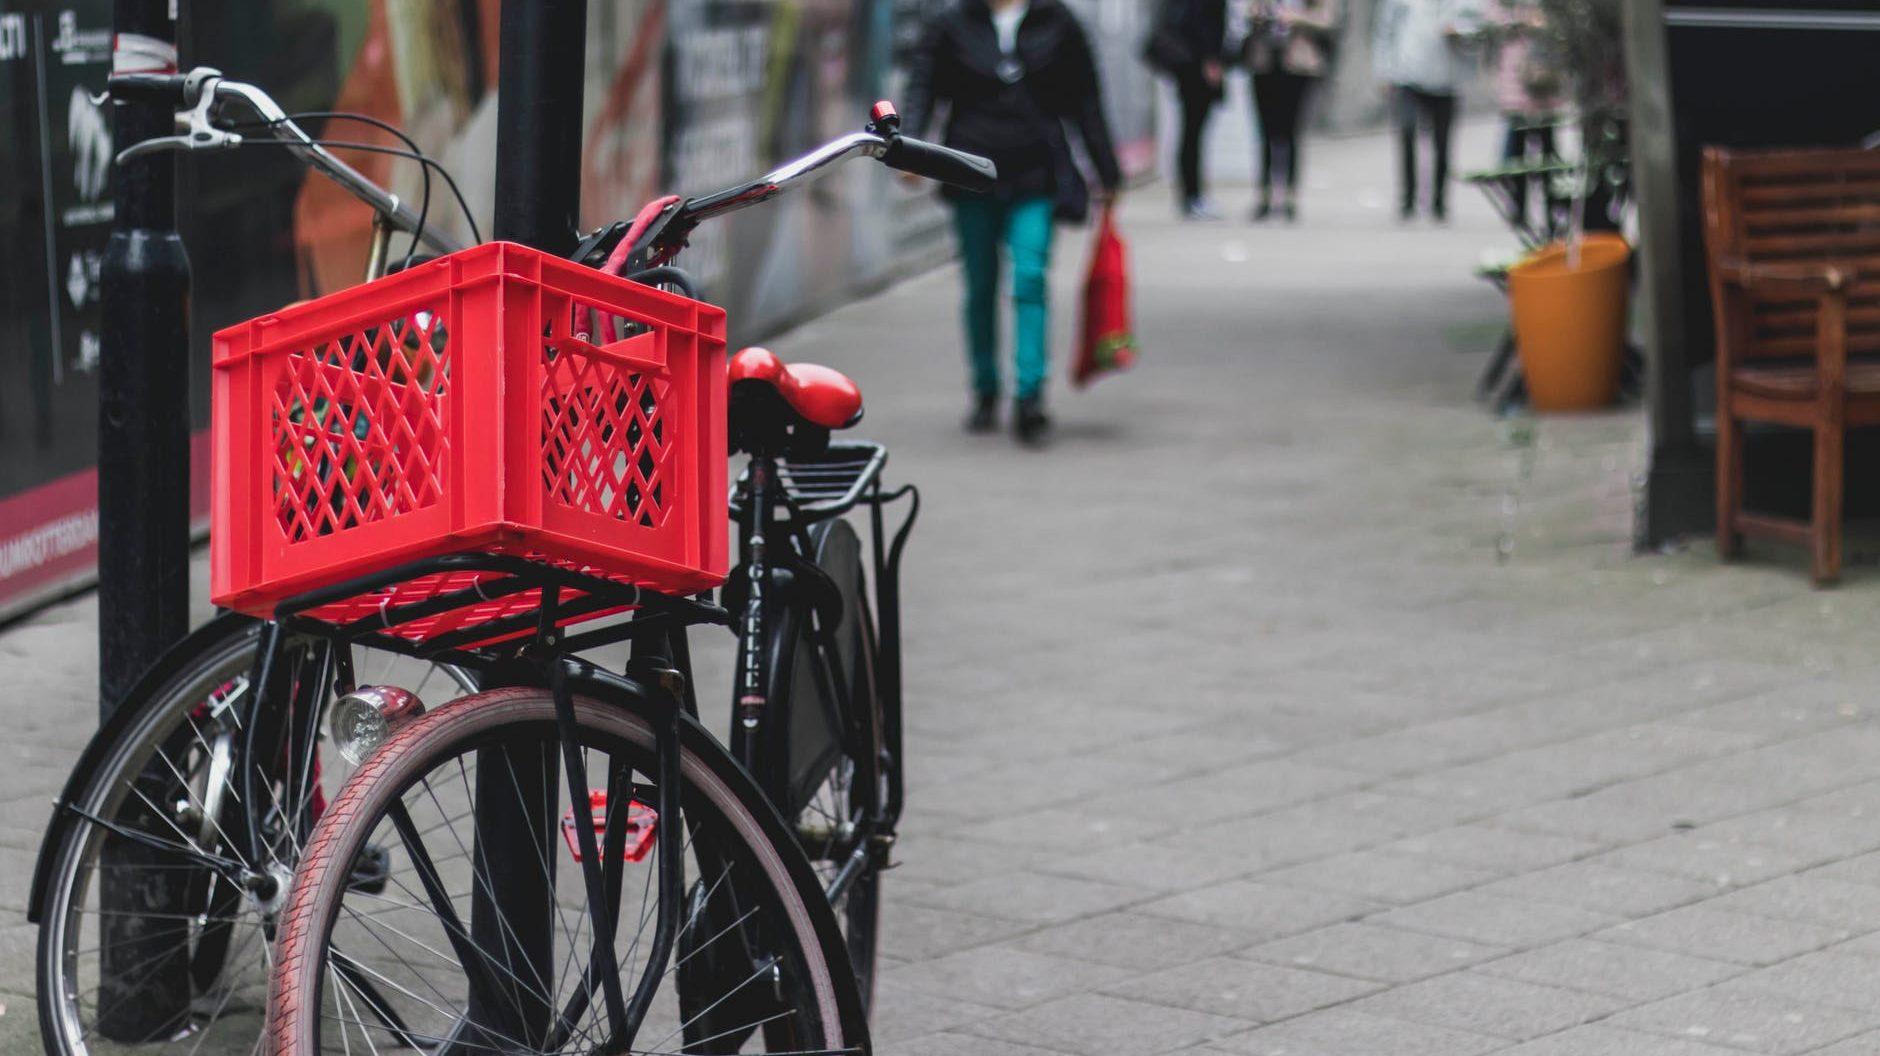 transportfiets in de stad